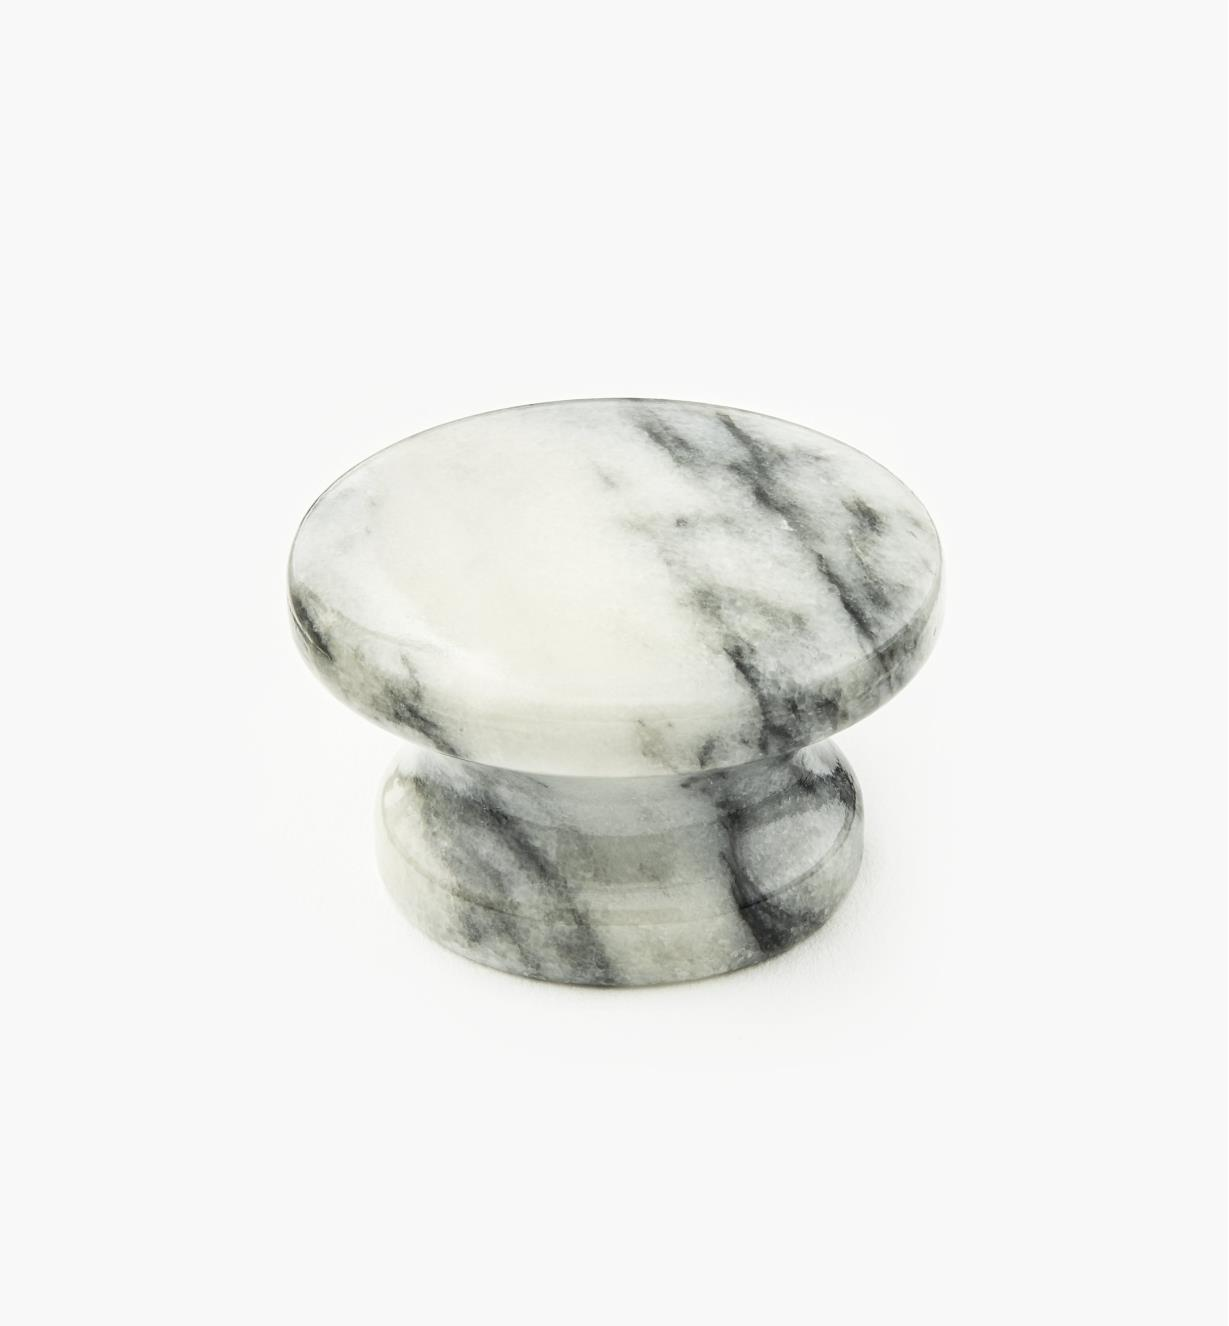 00W4034 - Bouton en marbre, blanc, 40 mm x 25 mm